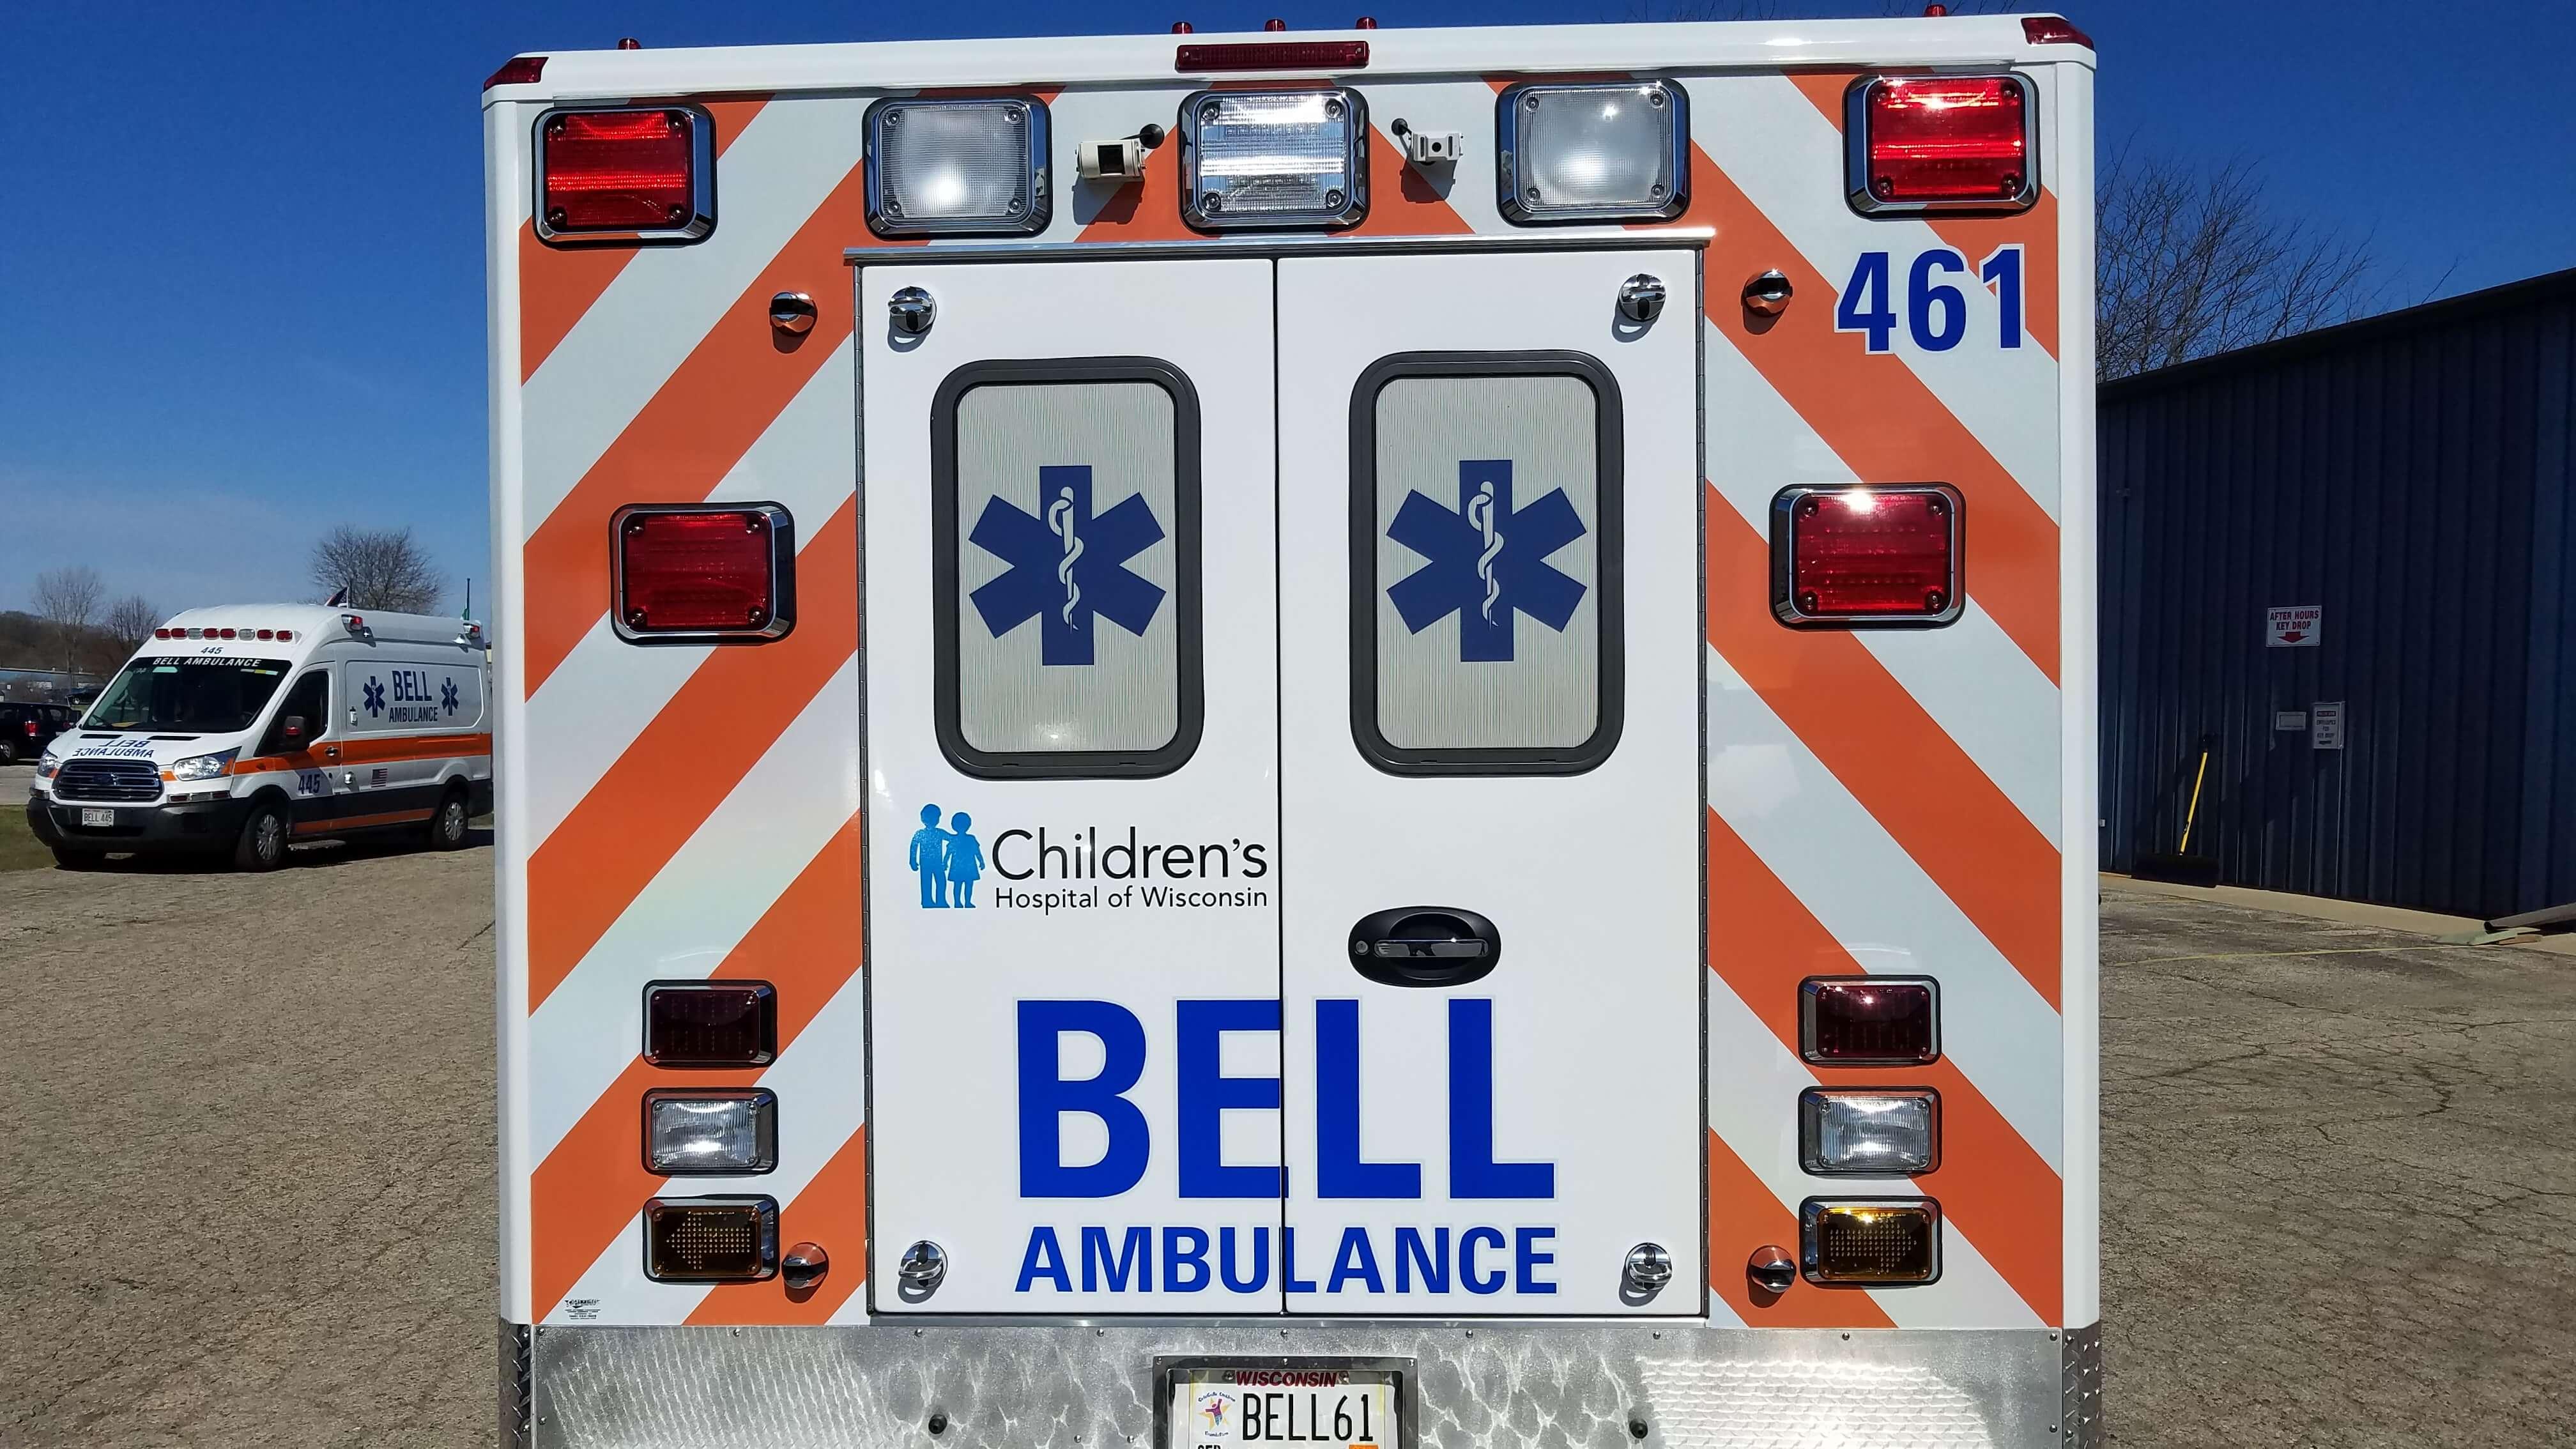 Bell ambulance Children's Hospital decals